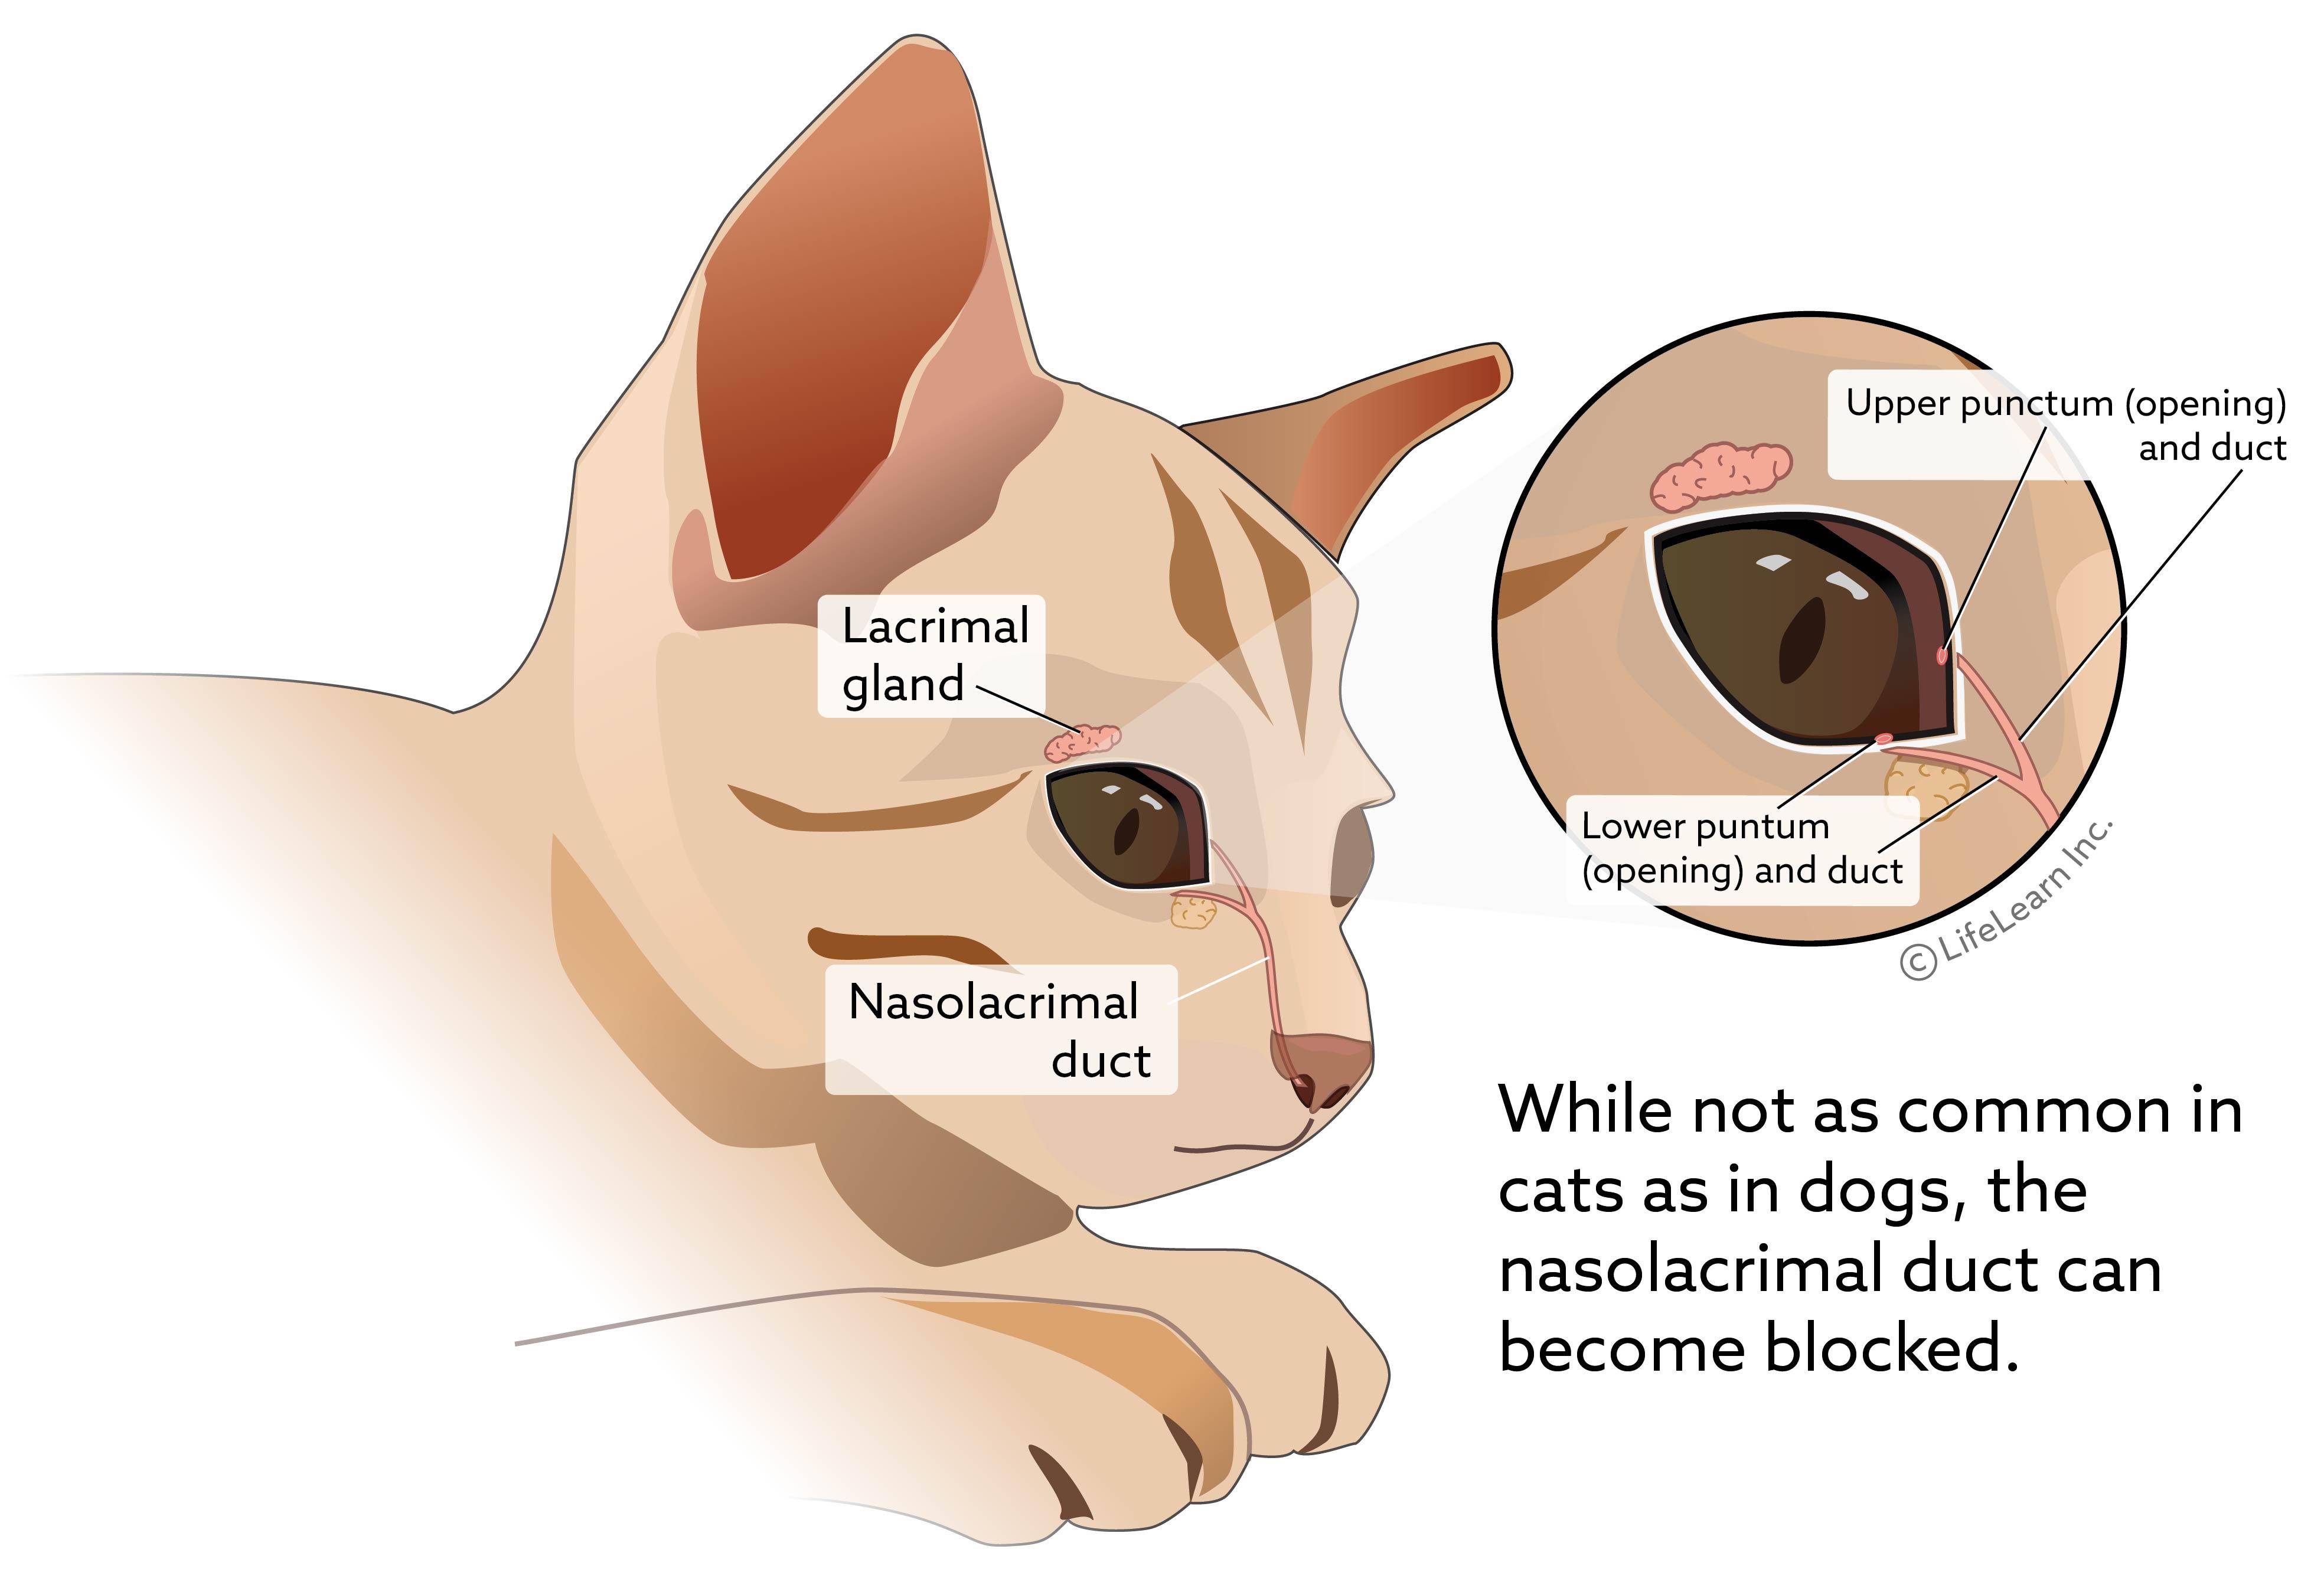 eye_lacrimal_gland2_cat_2018-02